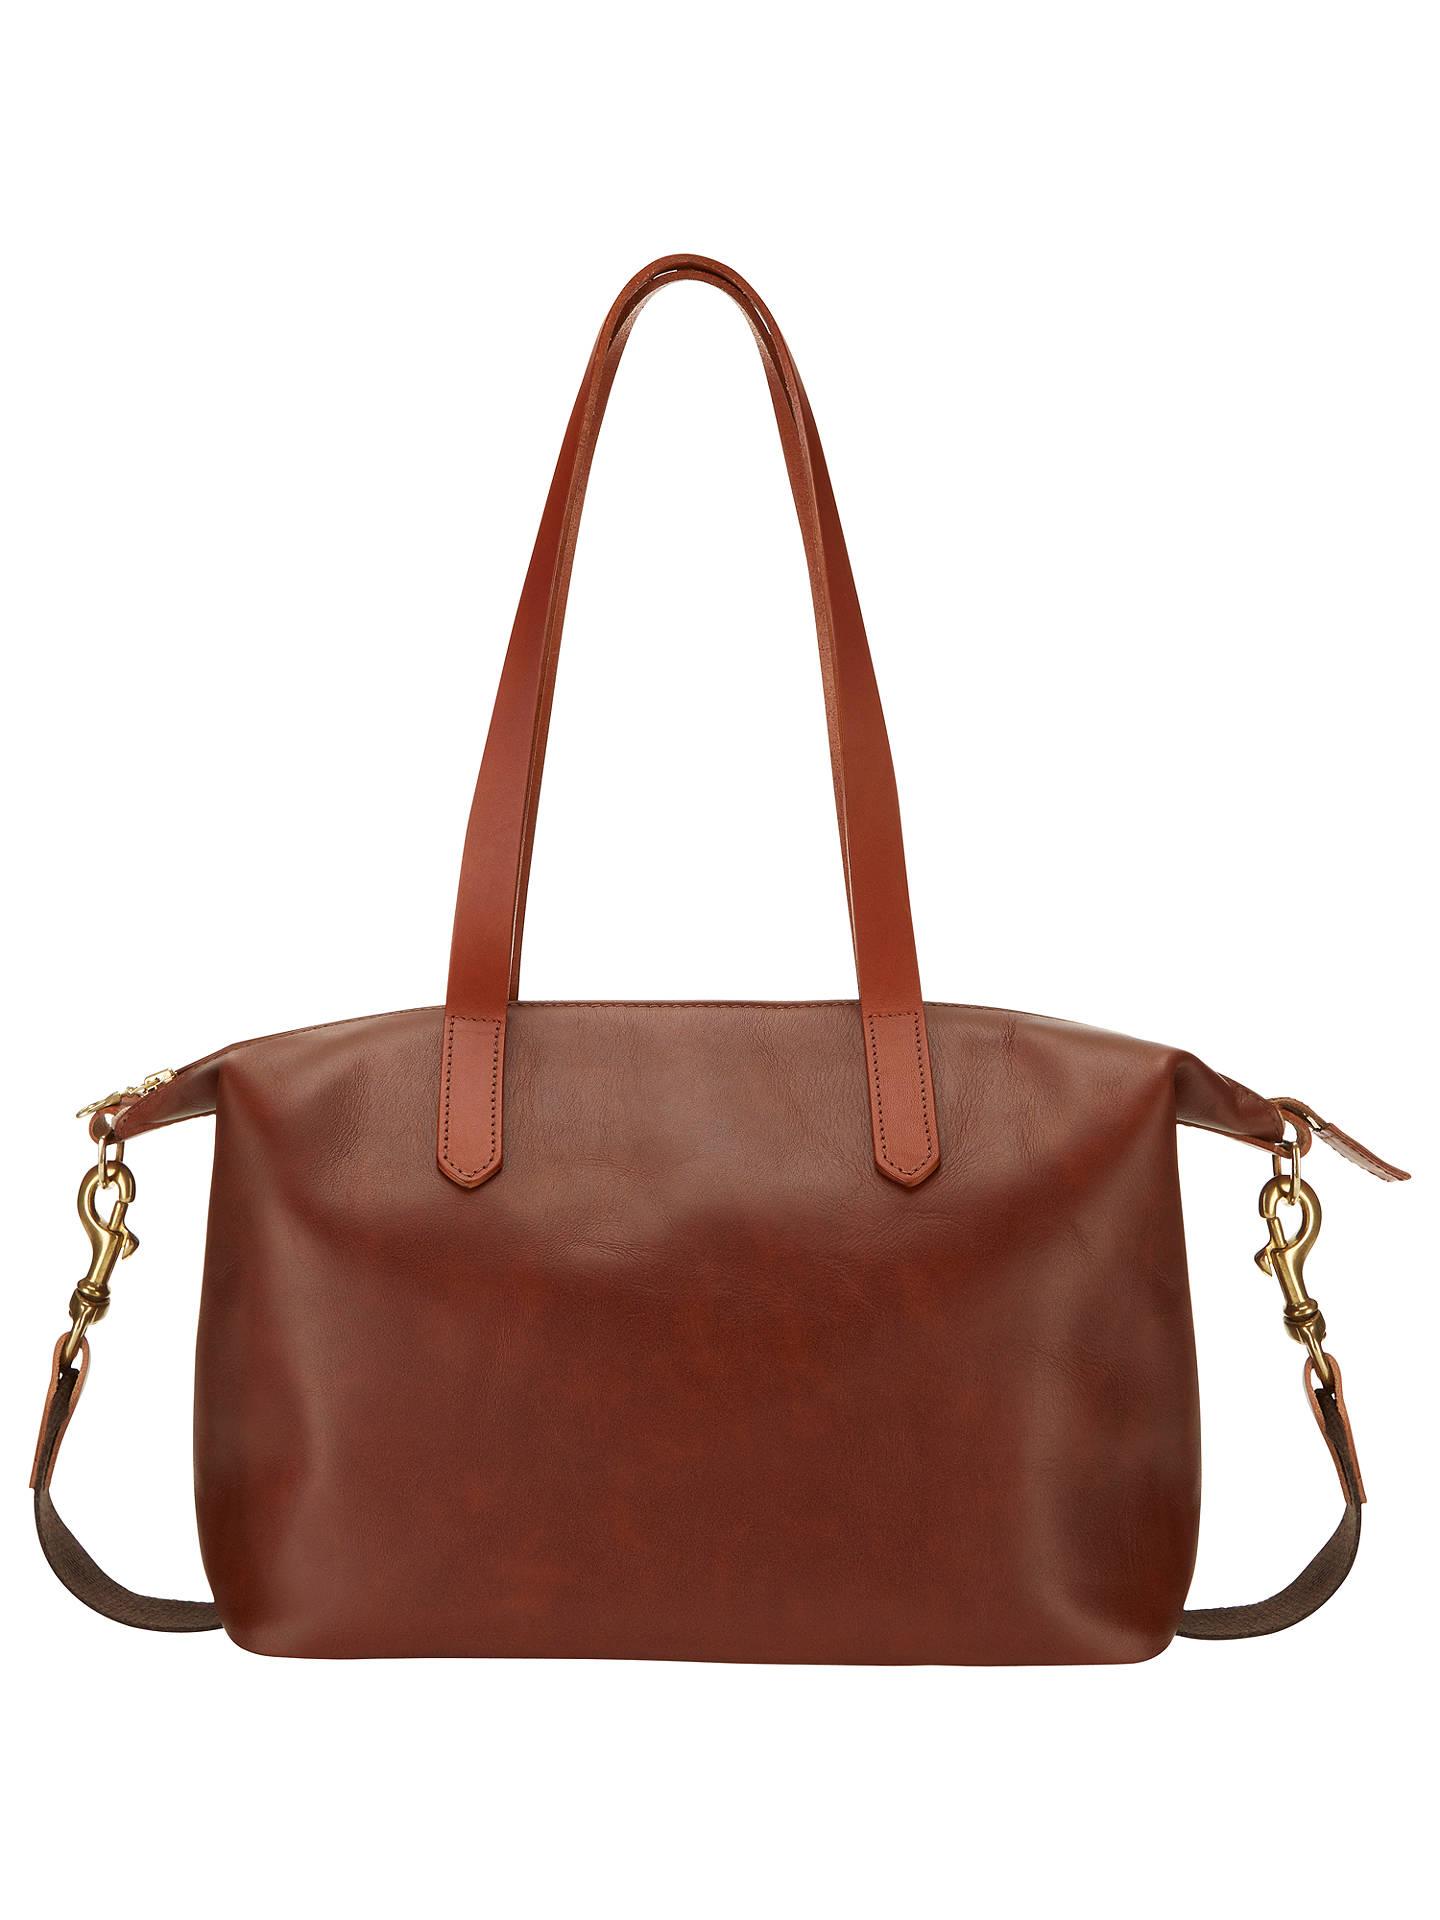 Mimi Berry Juno Leather Shoulder Bag Tan Online At Johnlewis